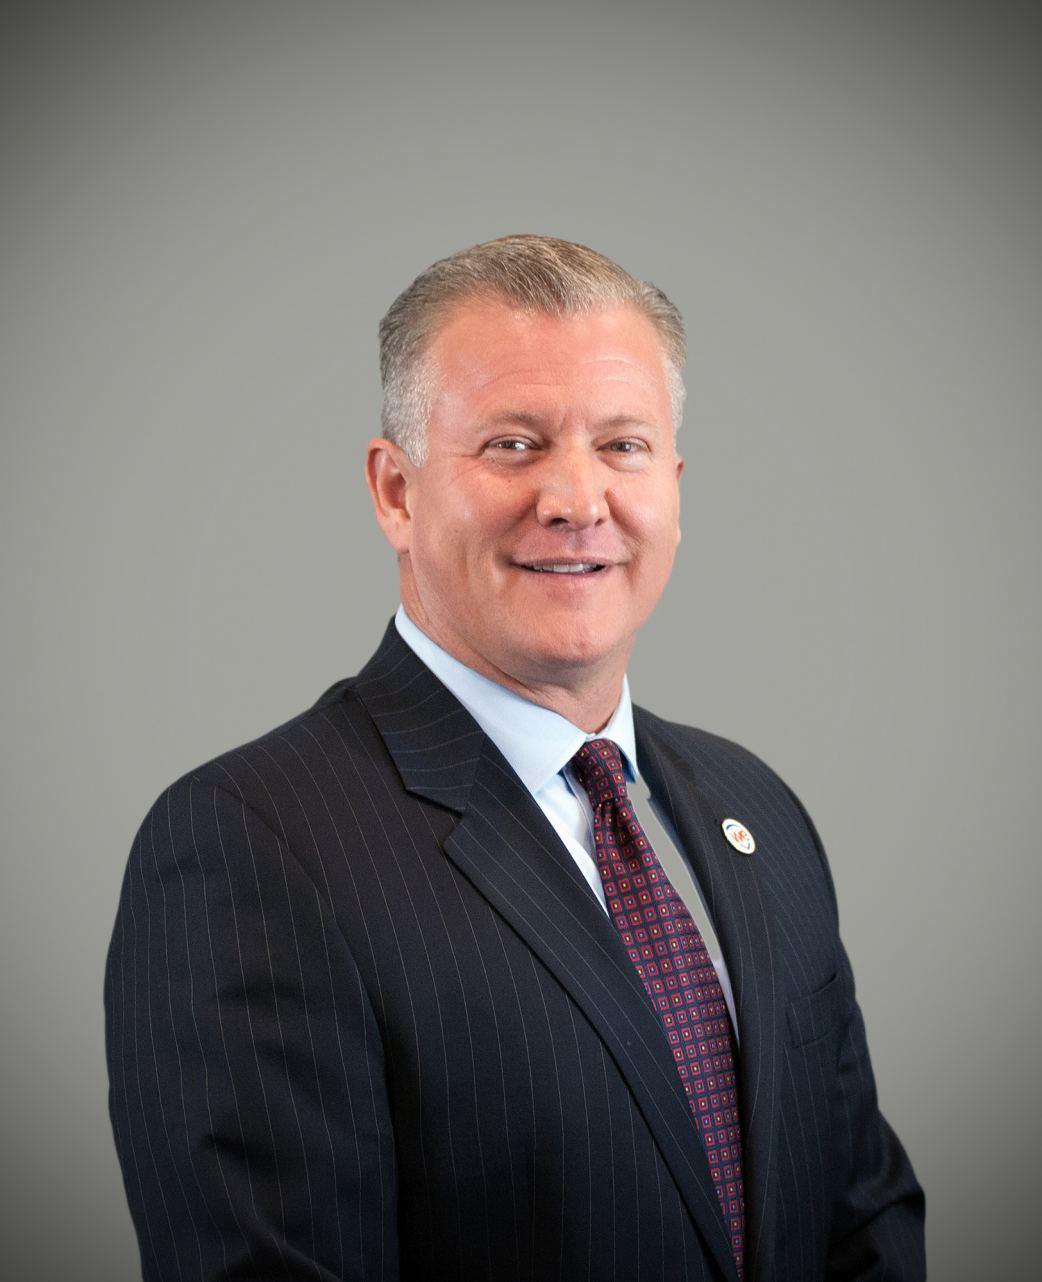 Chief Development Officer, Chris Pflueger